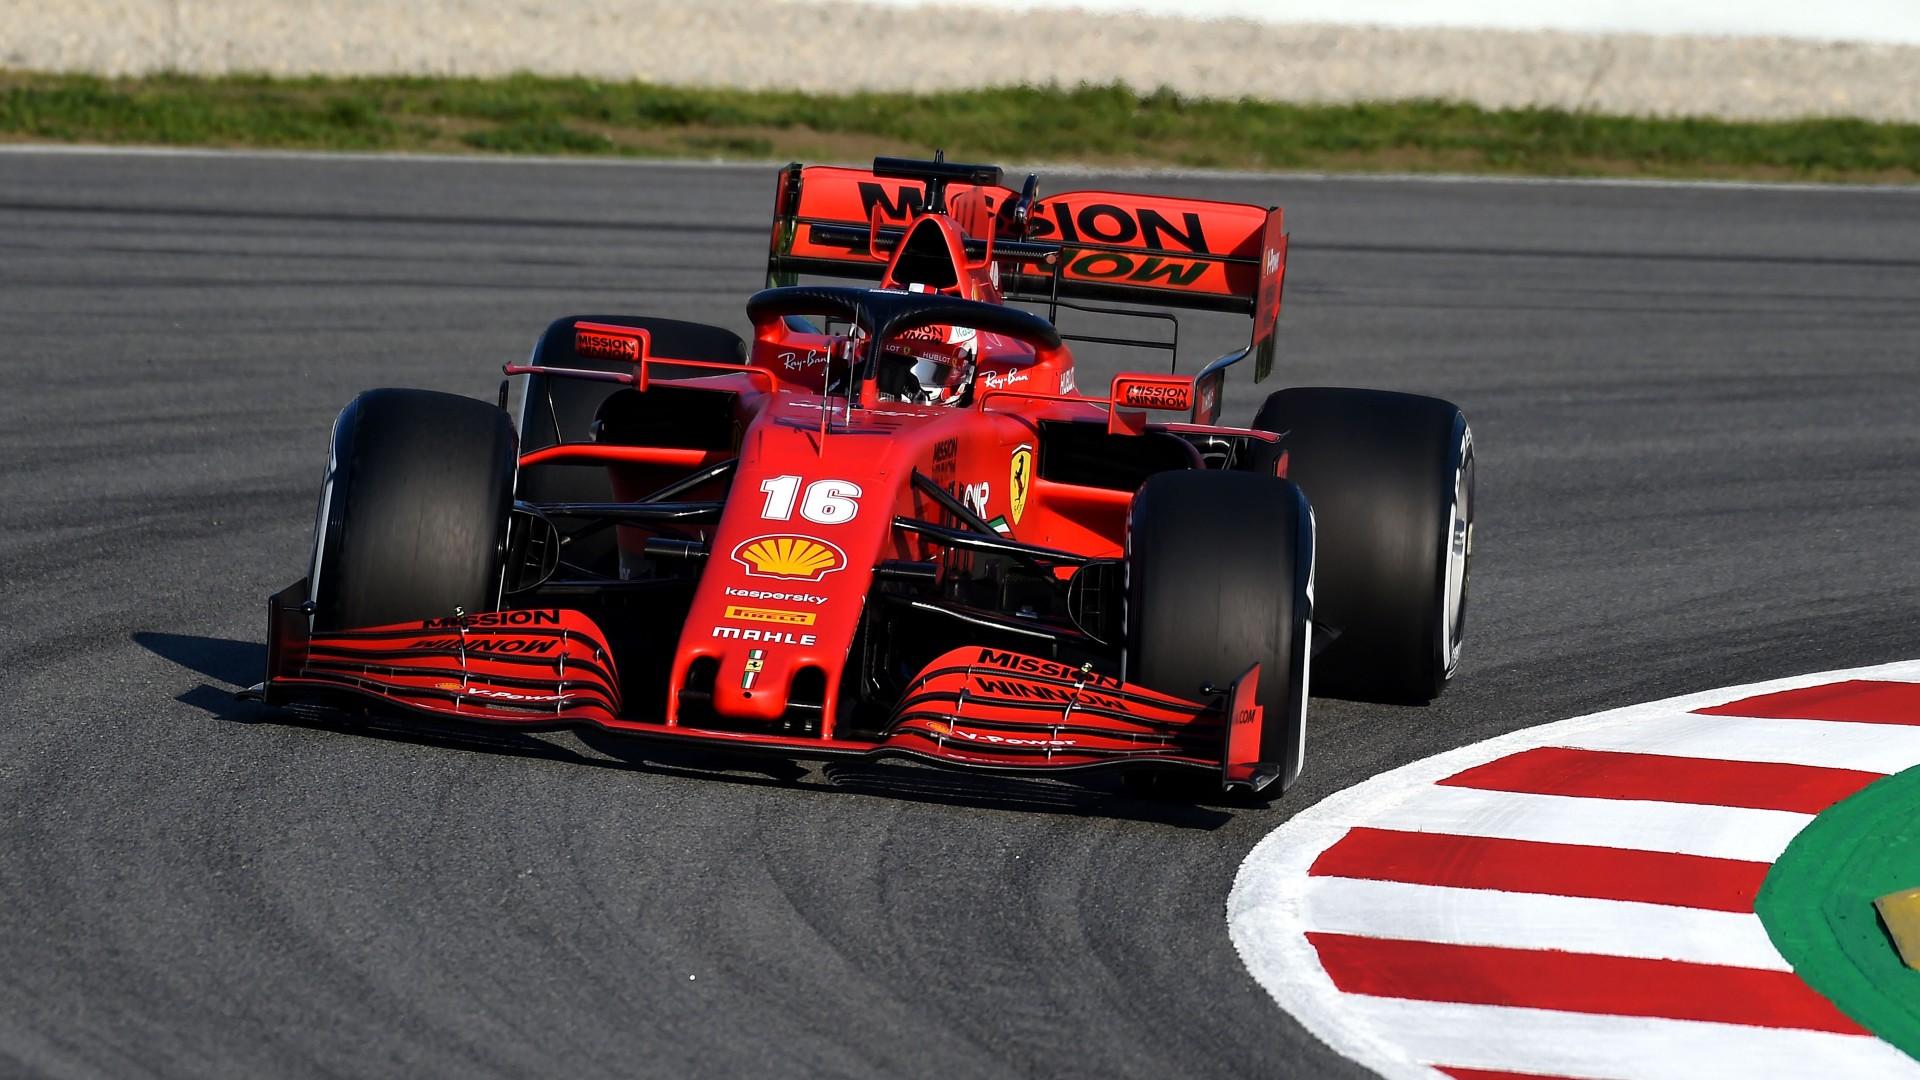 Ferrari SF1000 2020 4K Wallpaper | HD Car Wallpapers | ID ...